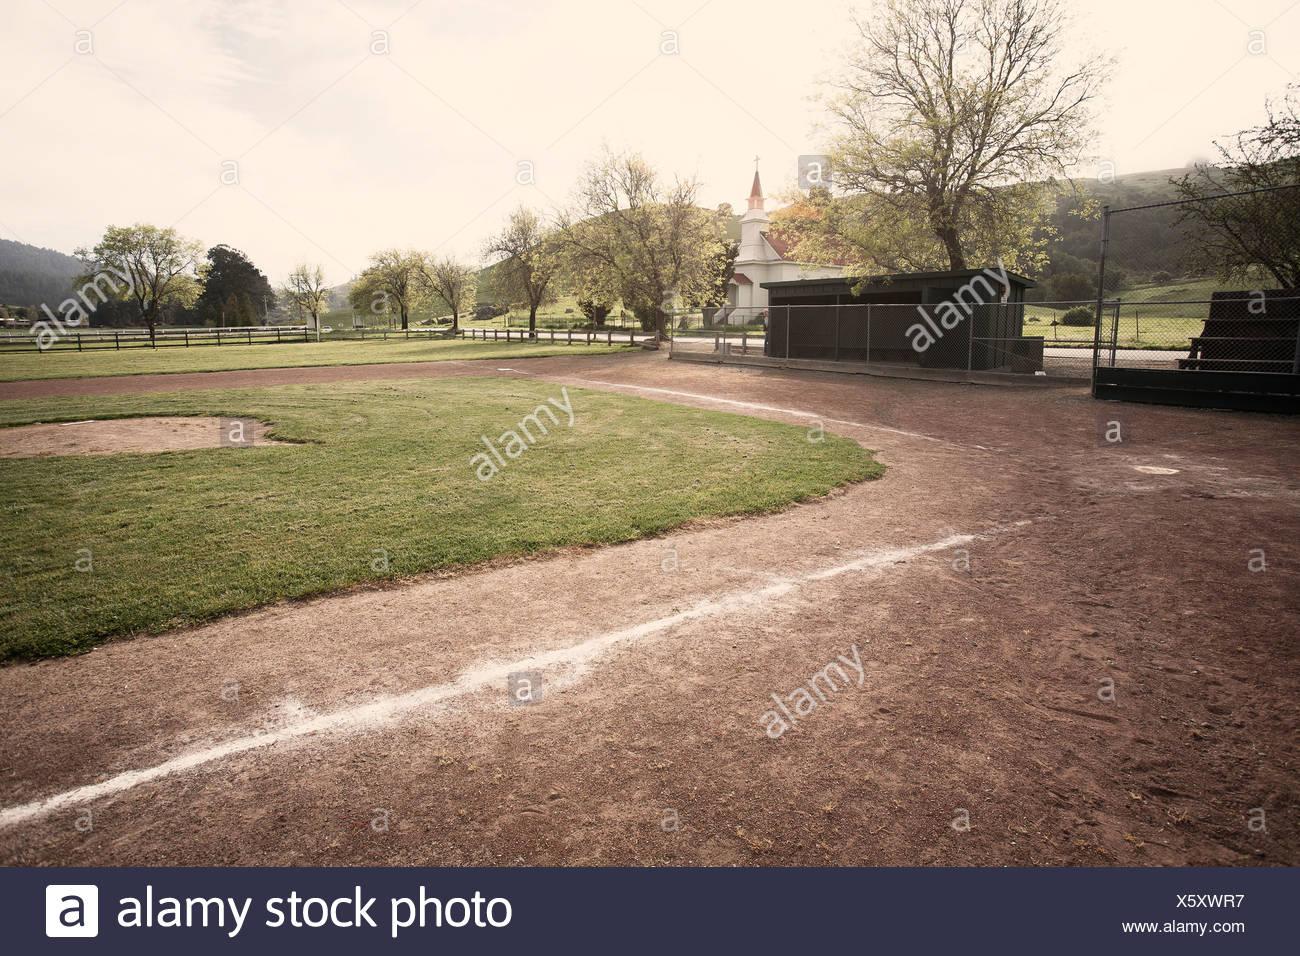 Baseball diamond in park - Stock Image